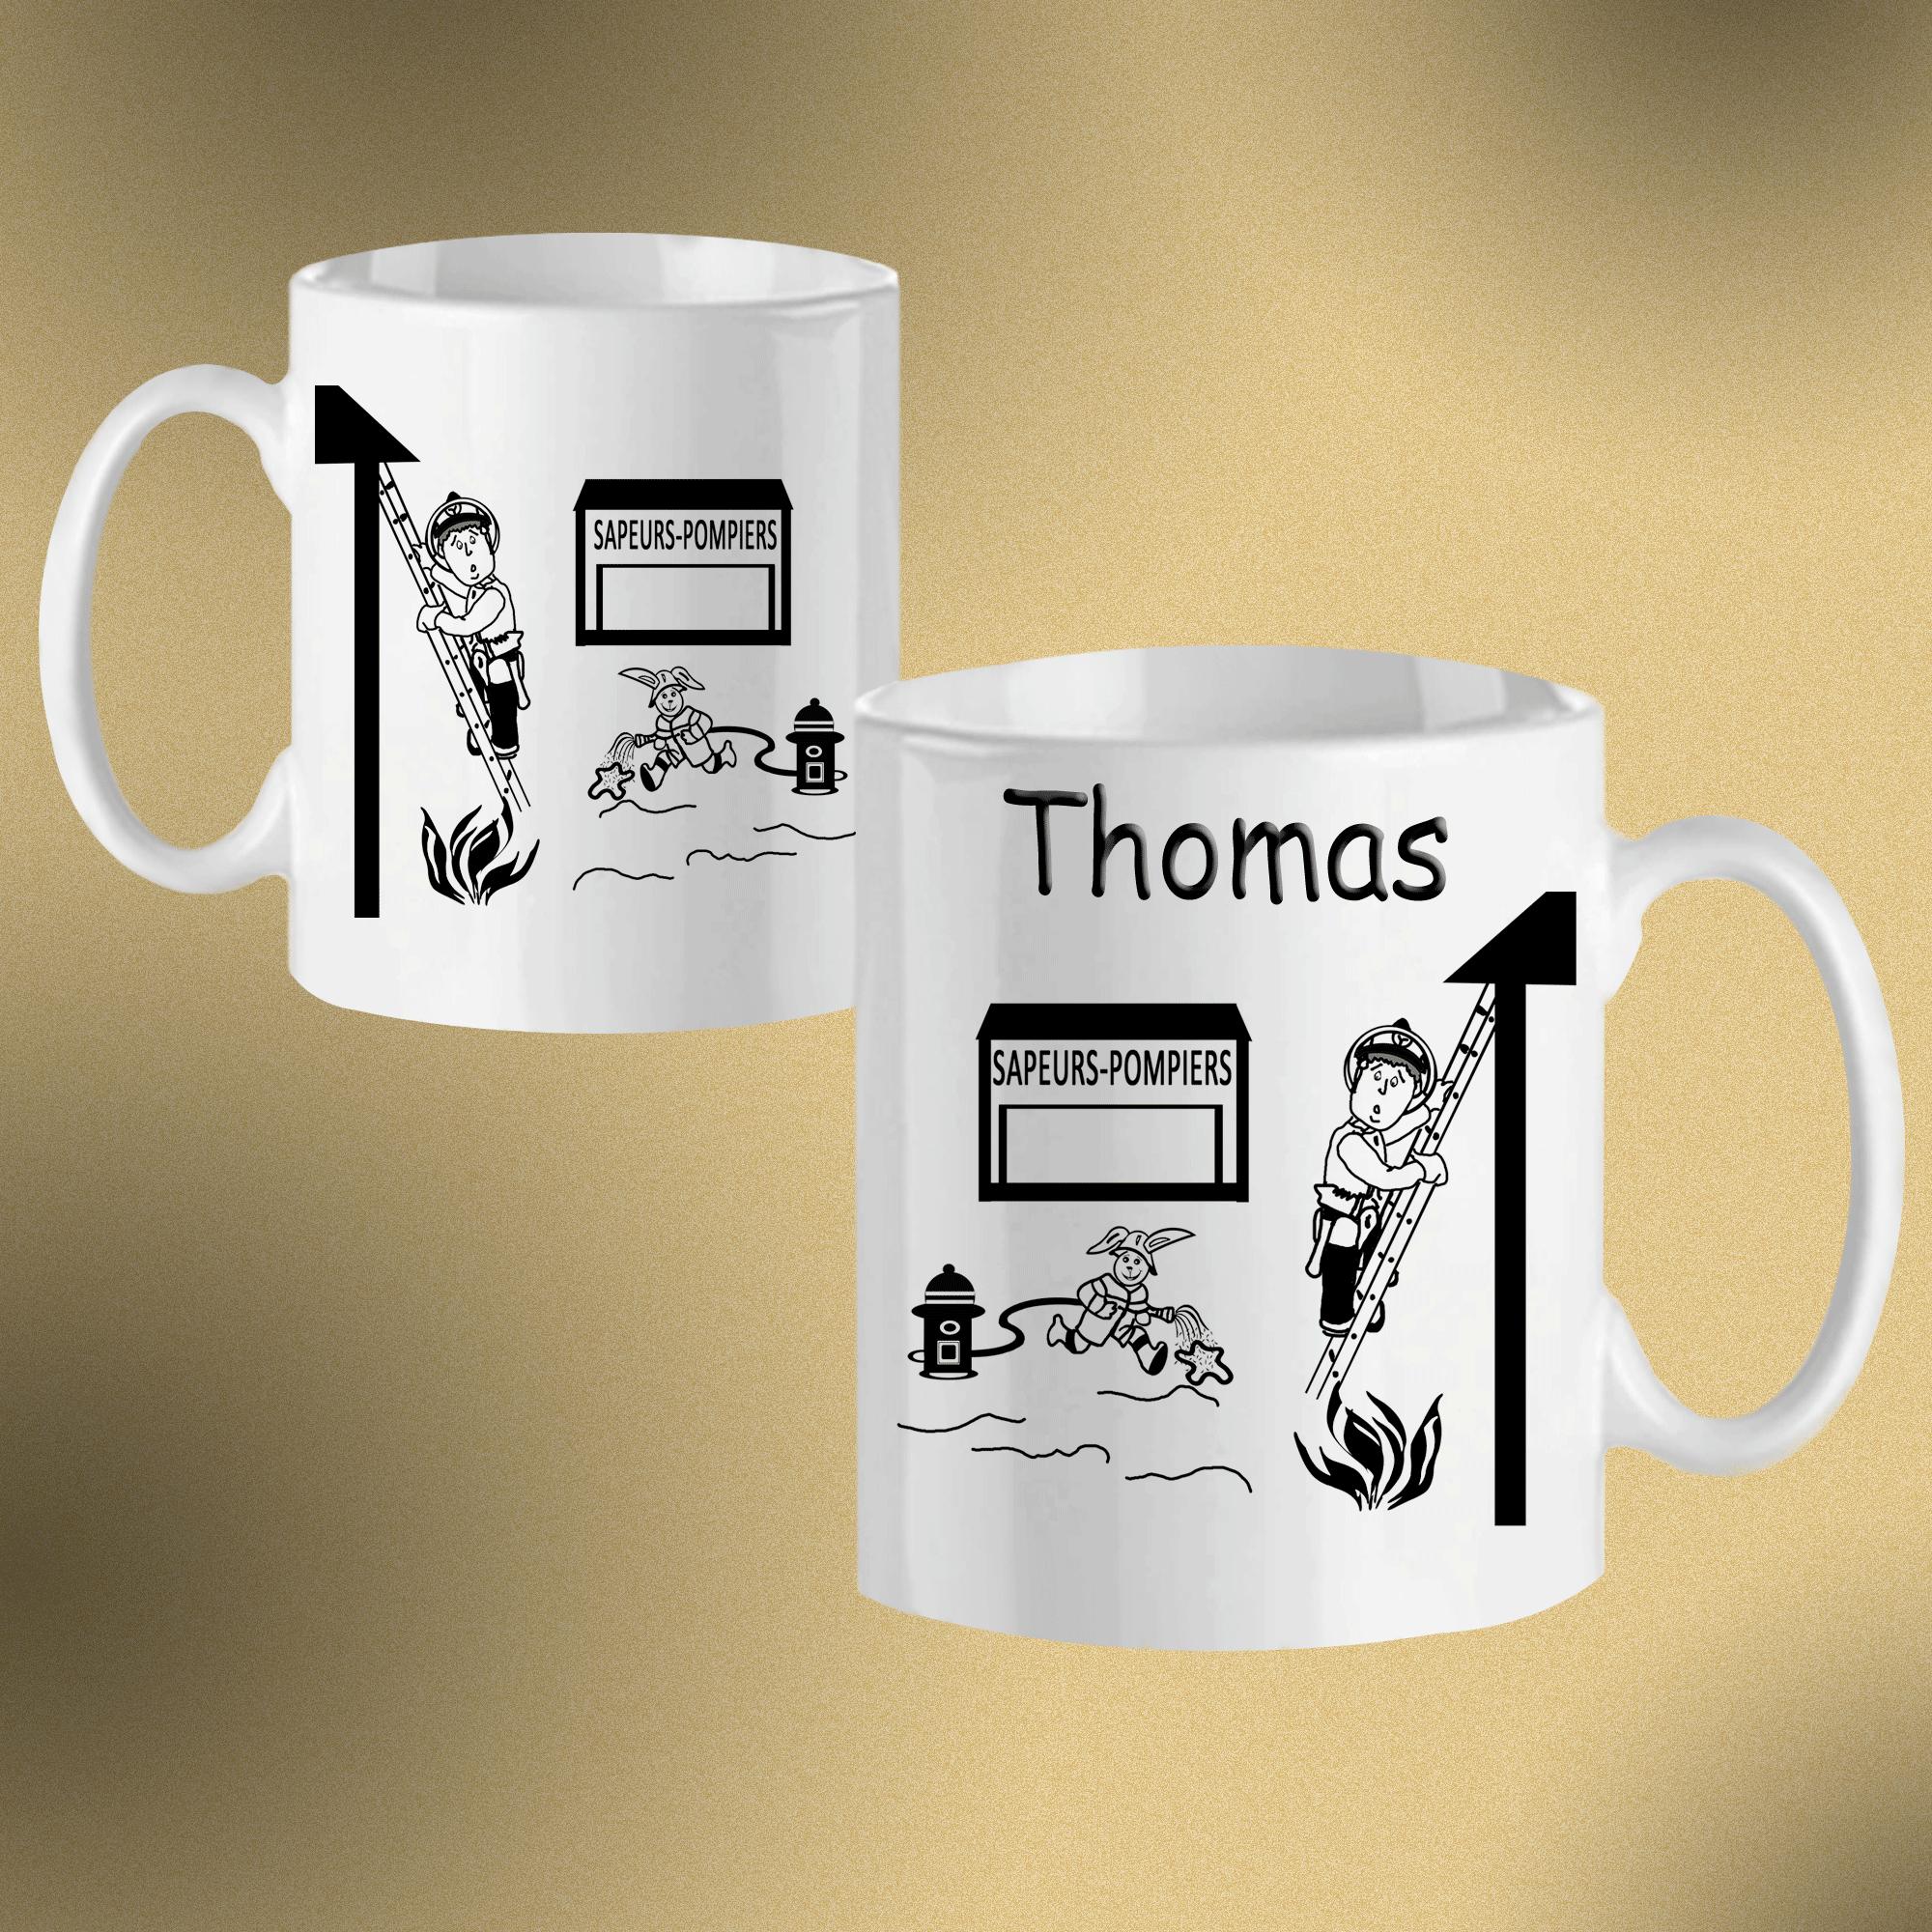 mug-blanc-texticadeaux-caserne-pompiers-casque-personnalisation-personnalise-personnalisable-soldat-du-feu-prenom-thomas